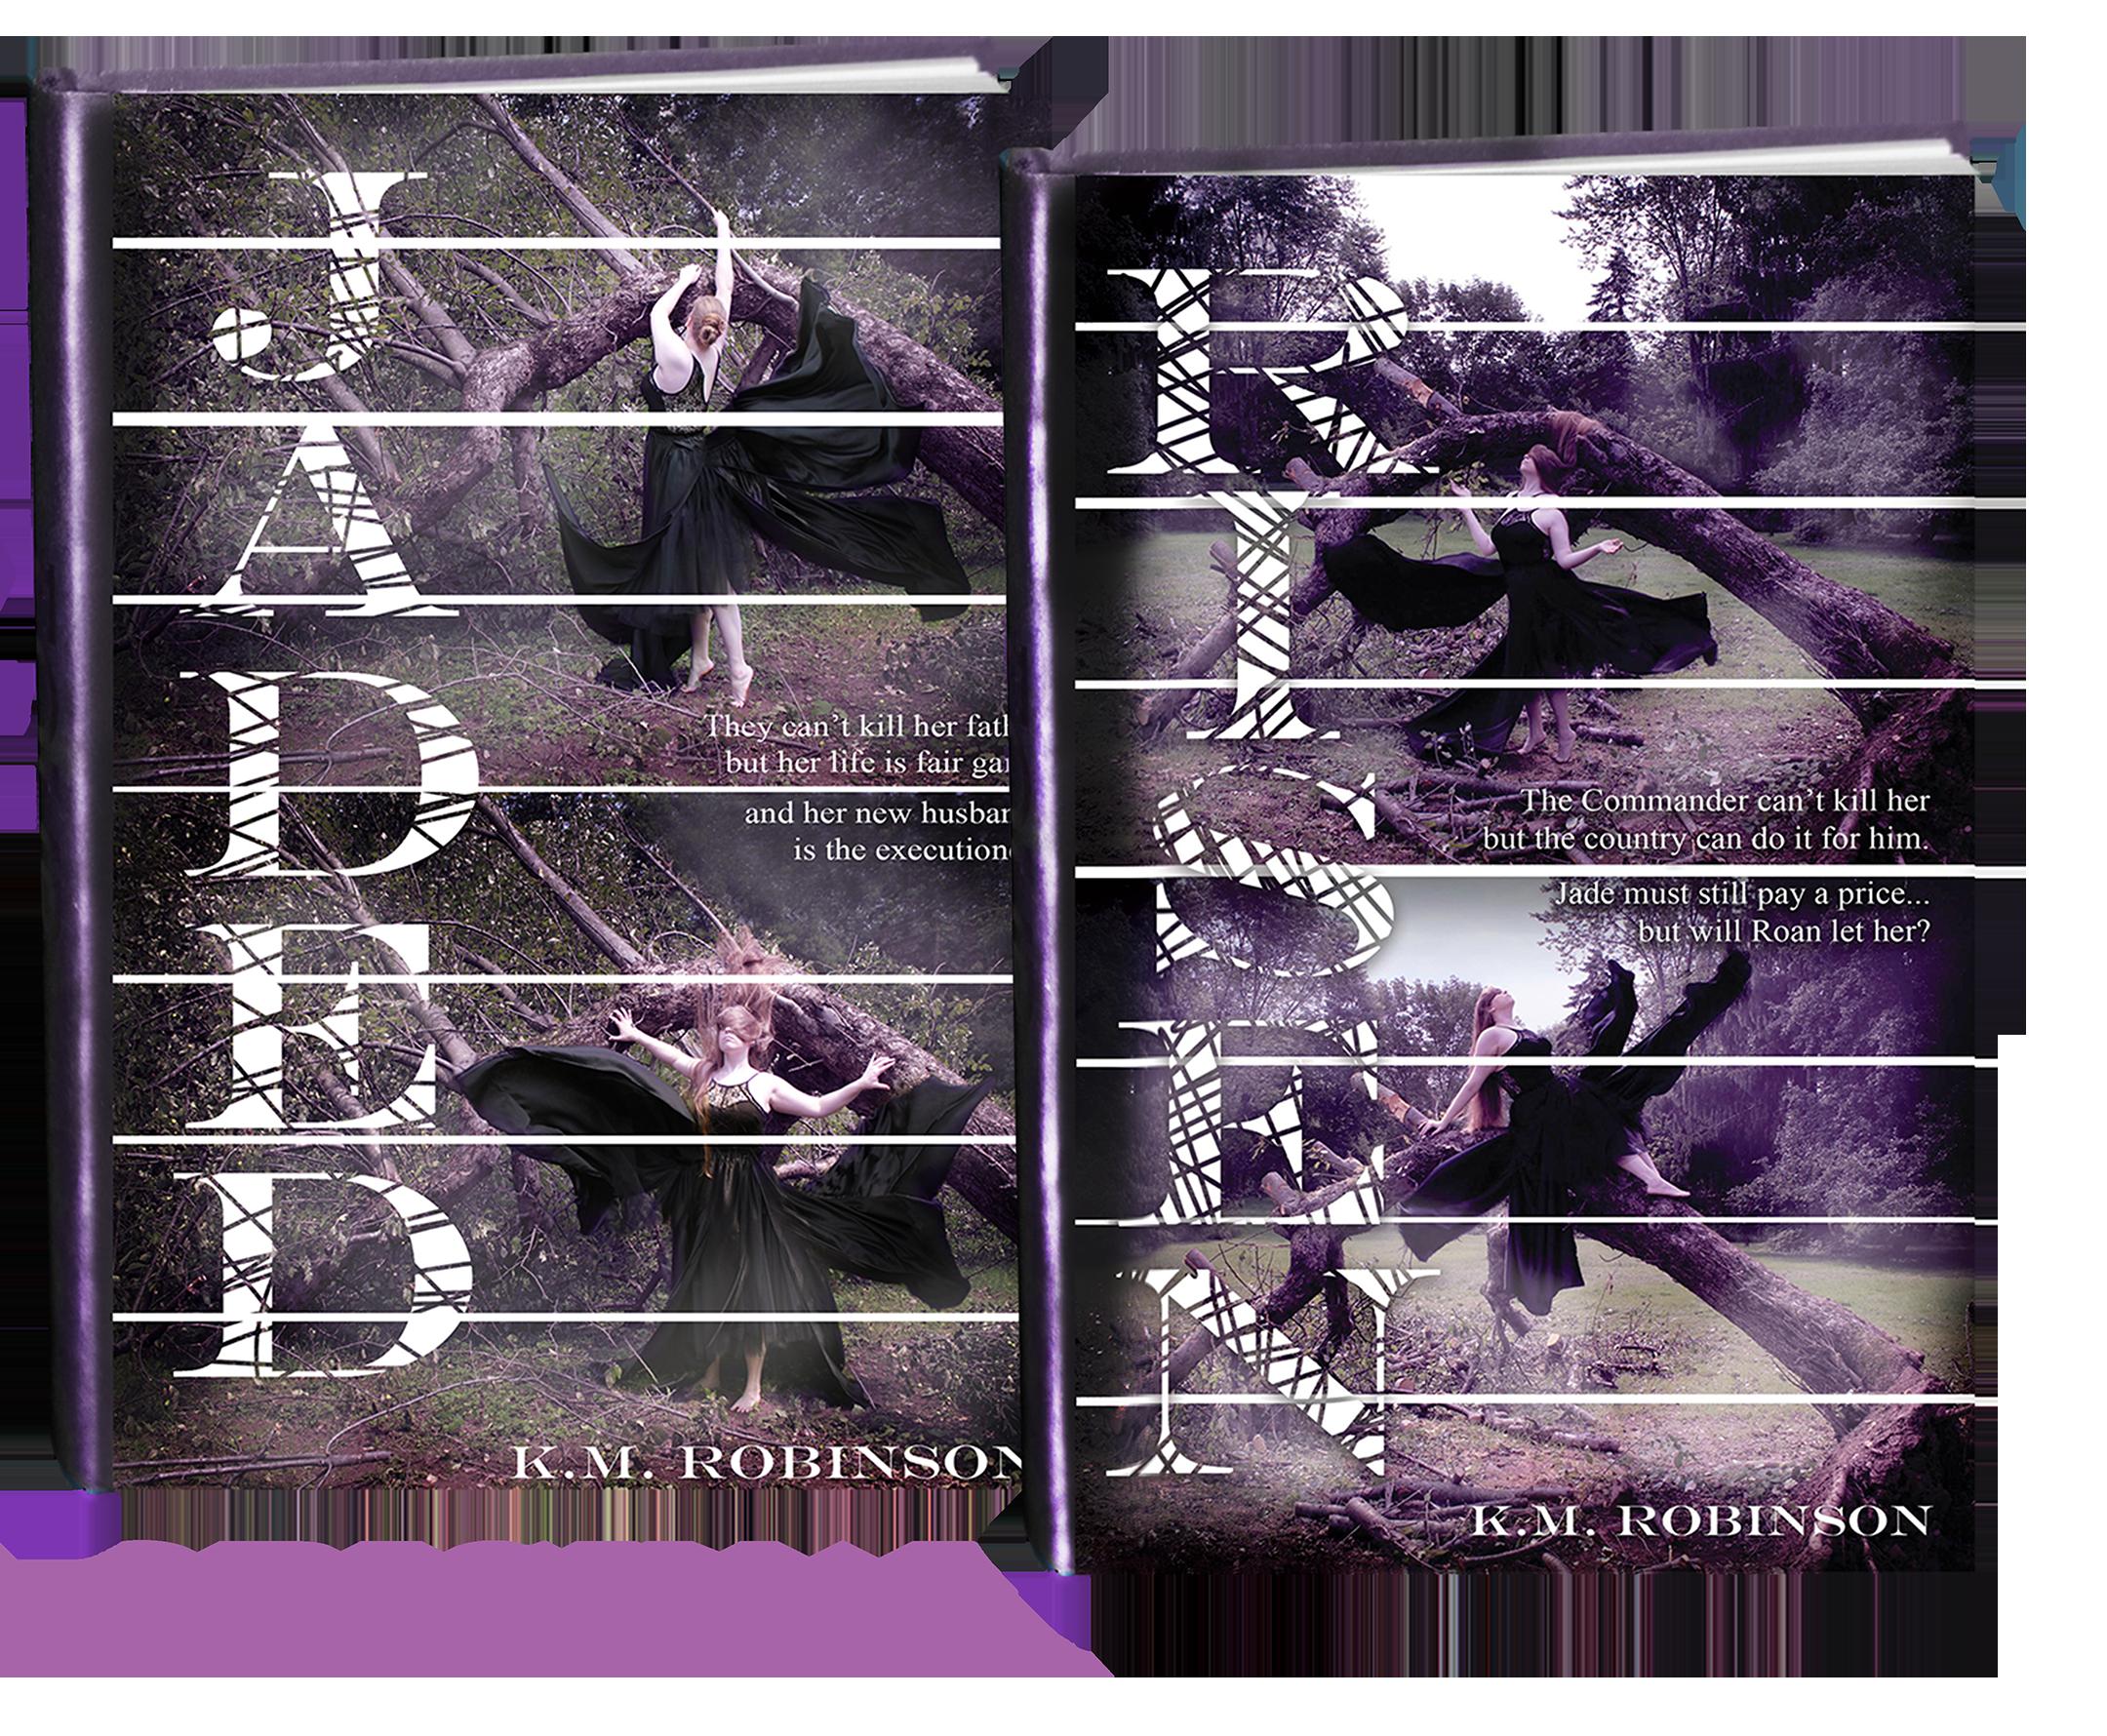 jaded original covers copy